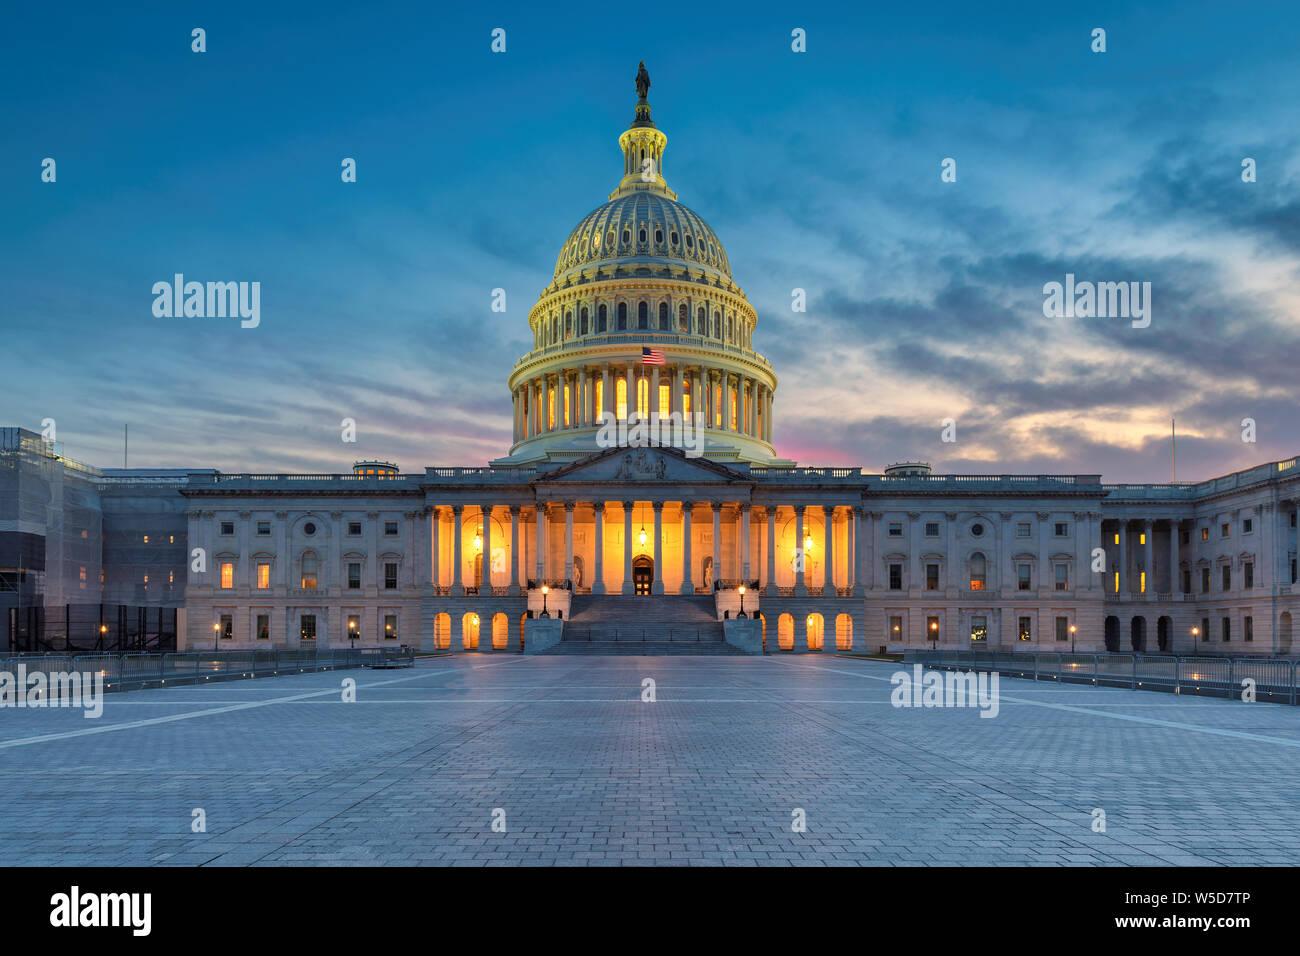 Der United States Capitol Building bei Sonnenuntergang, Washington DC, USA. Stockfoto